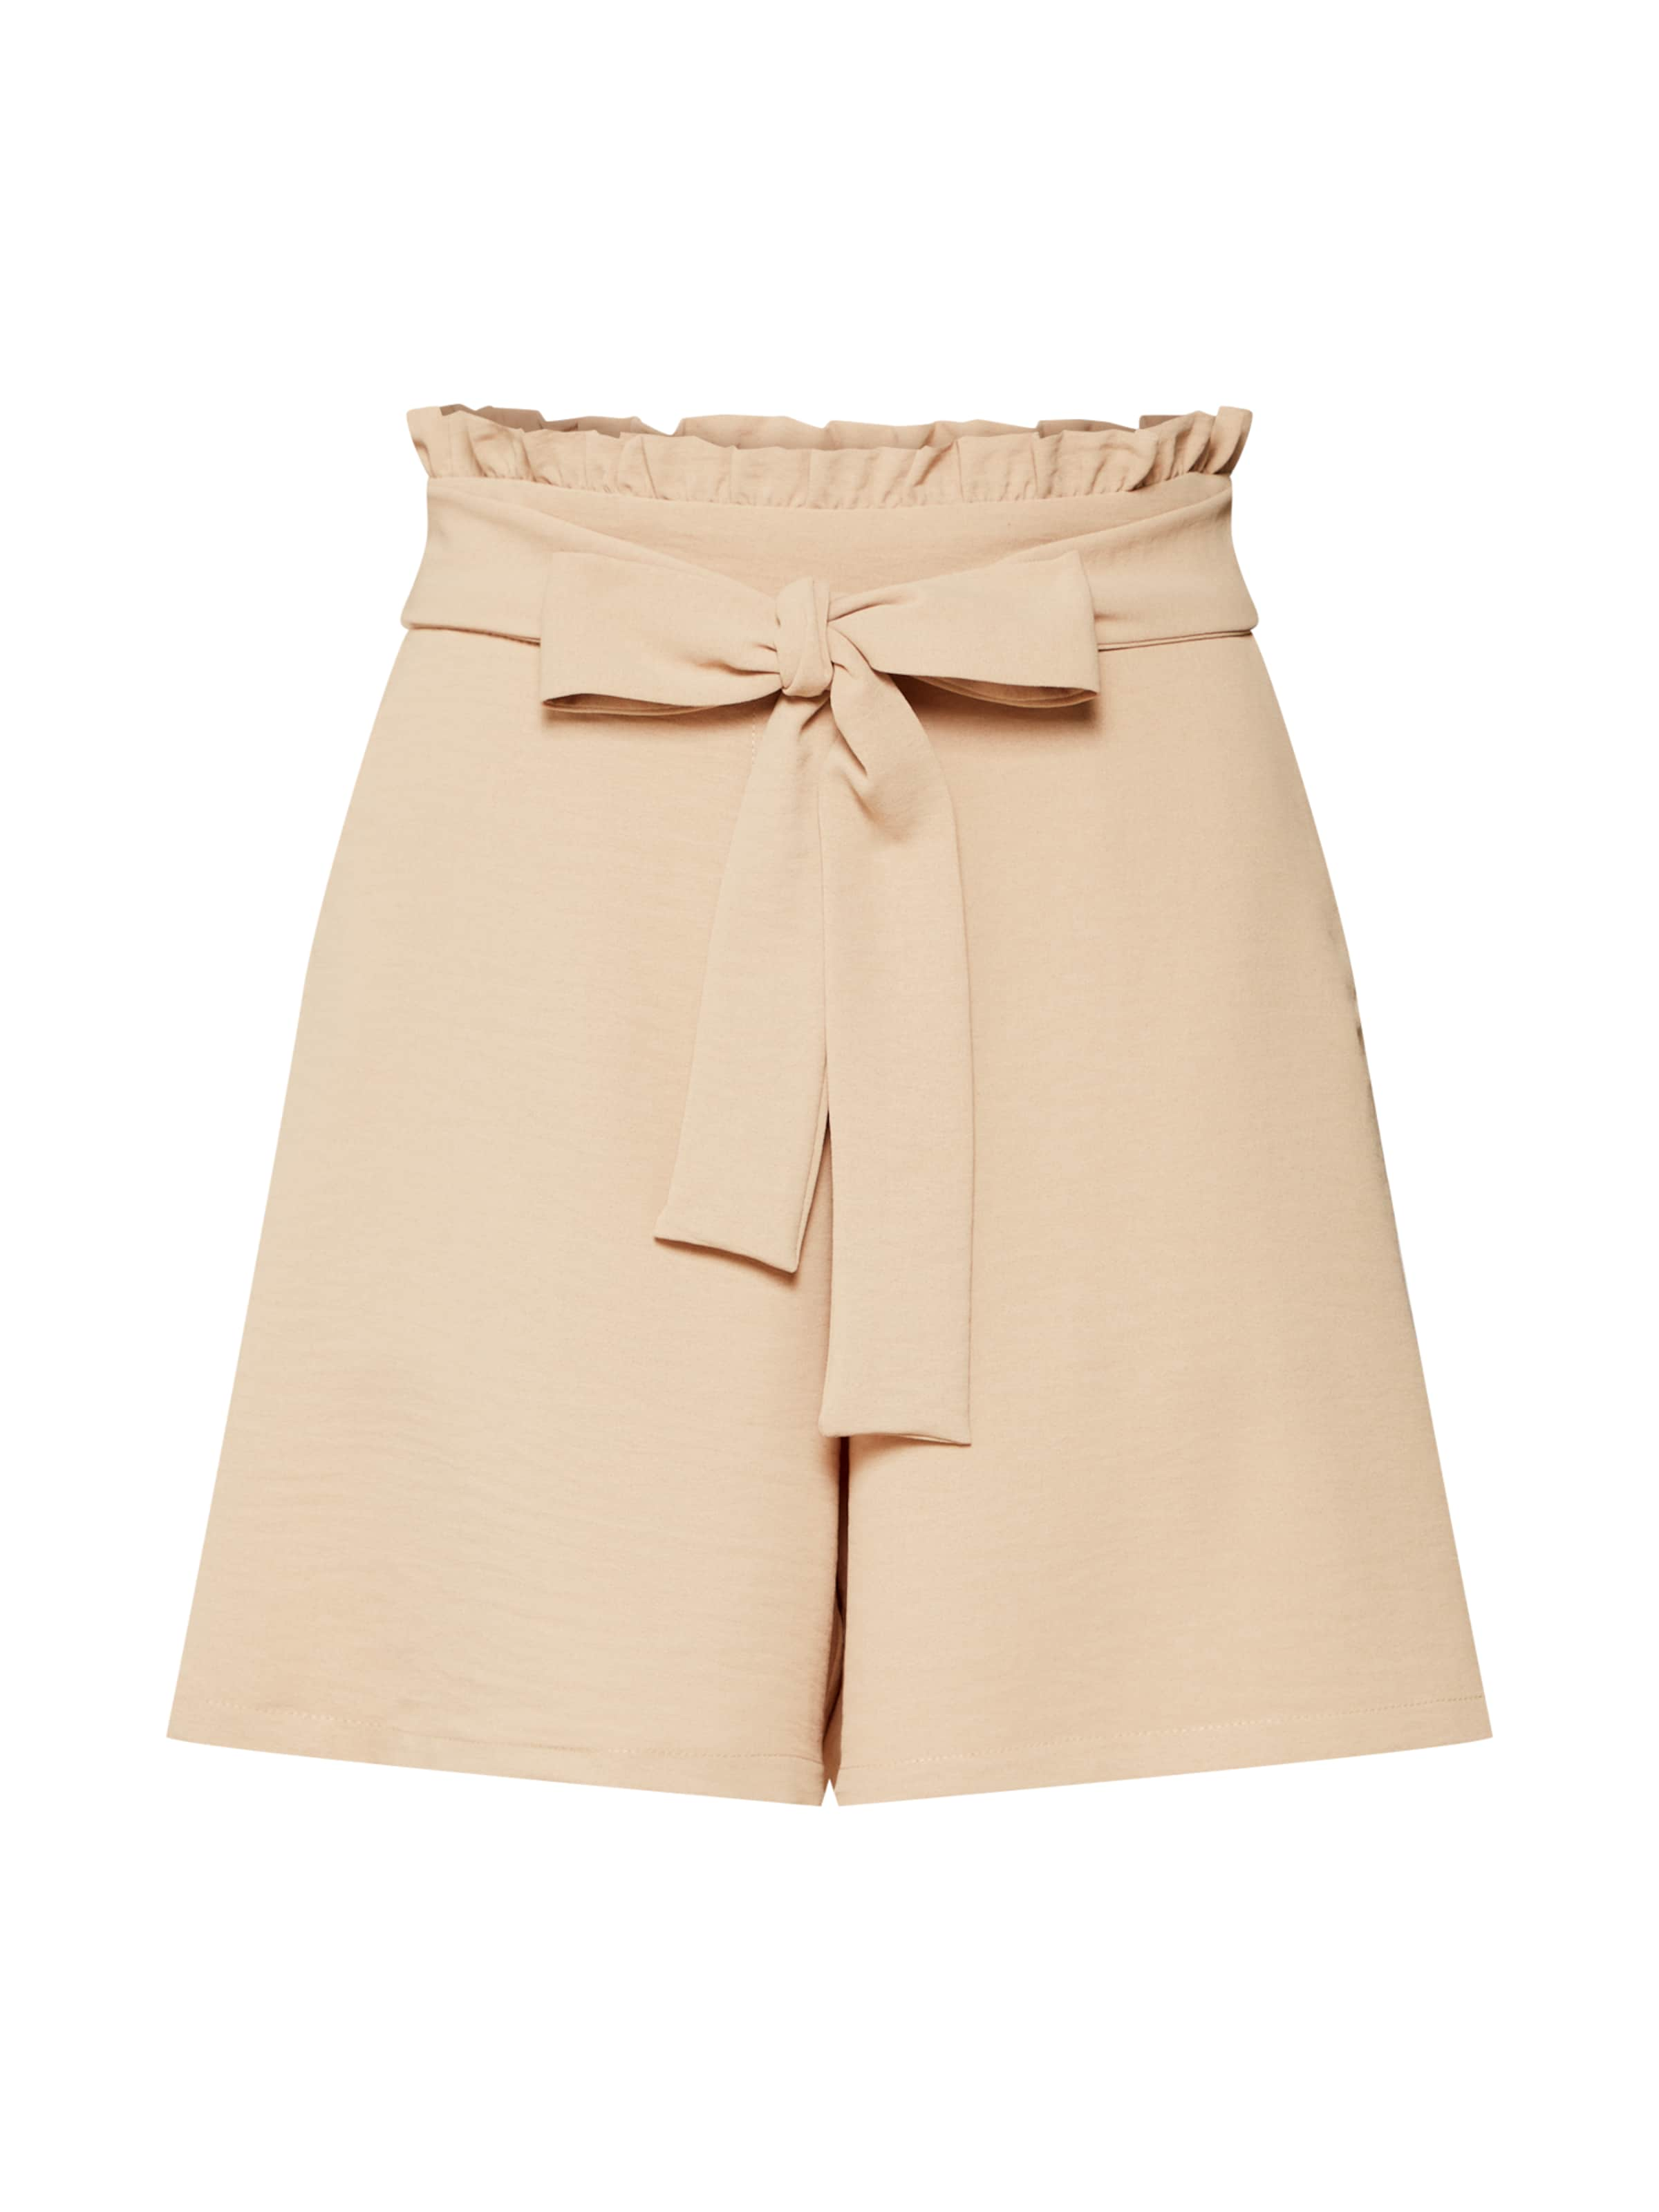 Vila 'rasha' Shorts Shorts In In Vila 'rasha' Camel Camel Vila Shorts hCtrBQxsdo